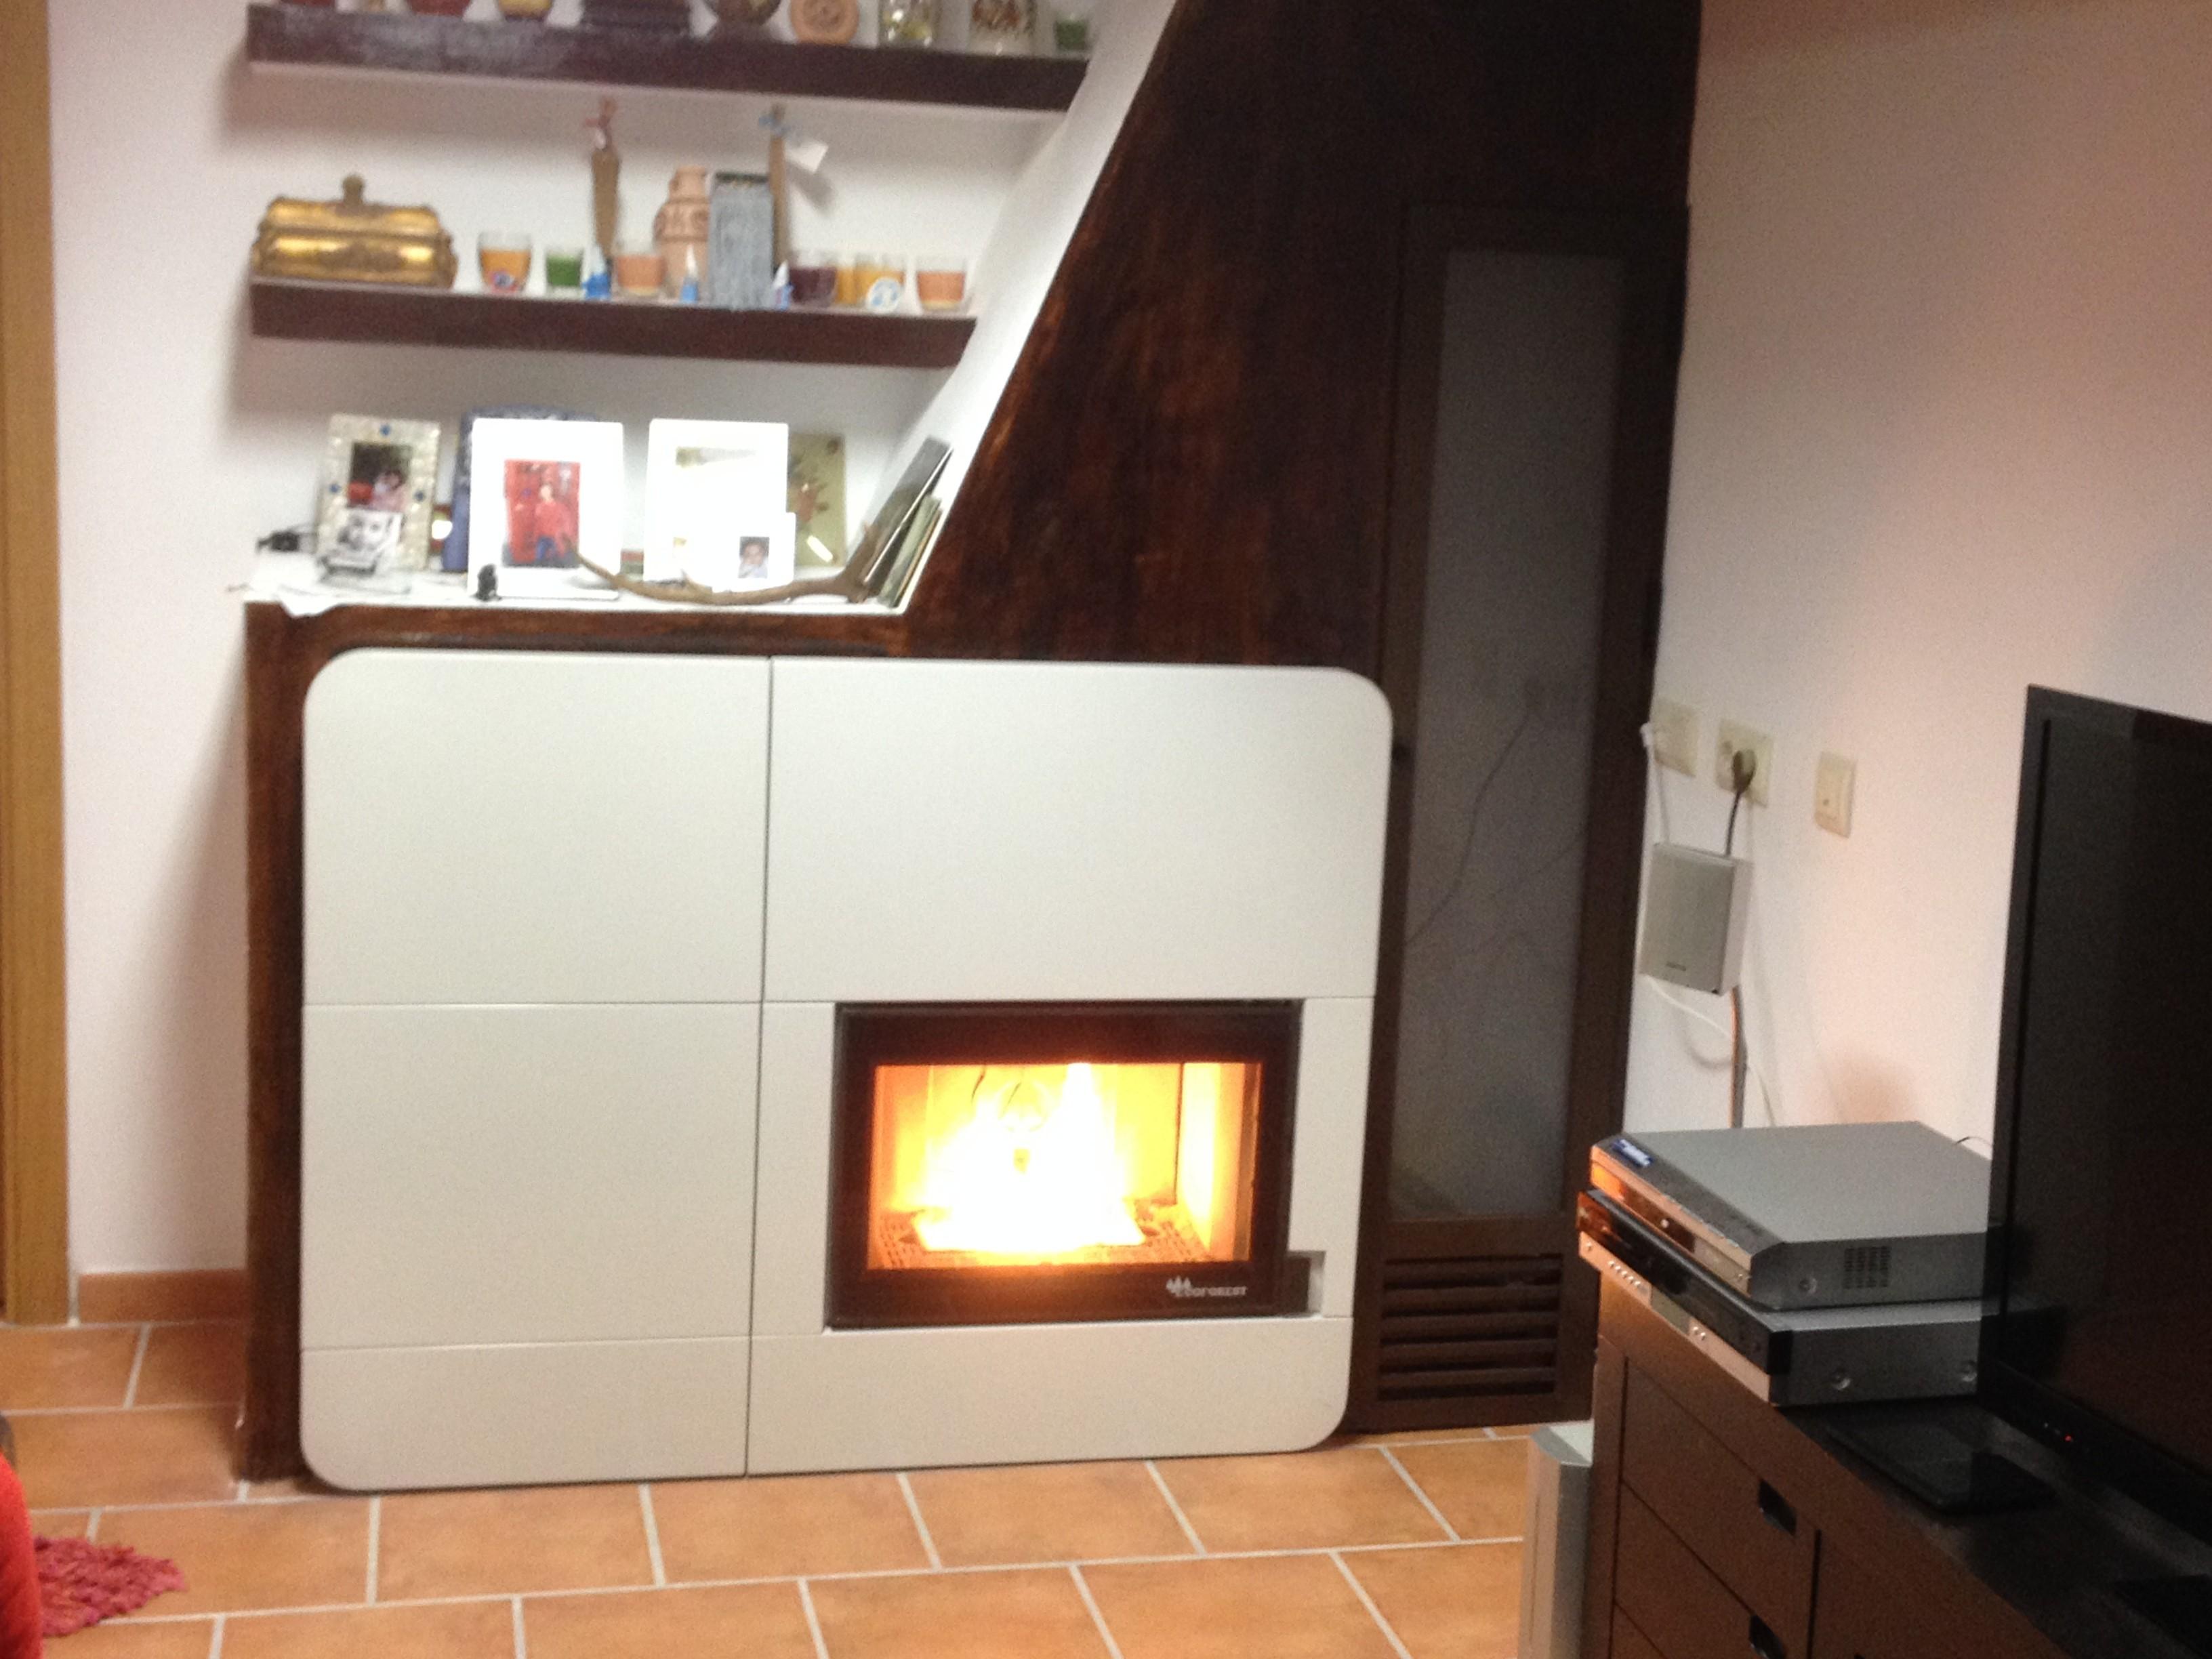 Estufa de pellets instalacion latest with estufa de - Instalar estufa pellets piso ...